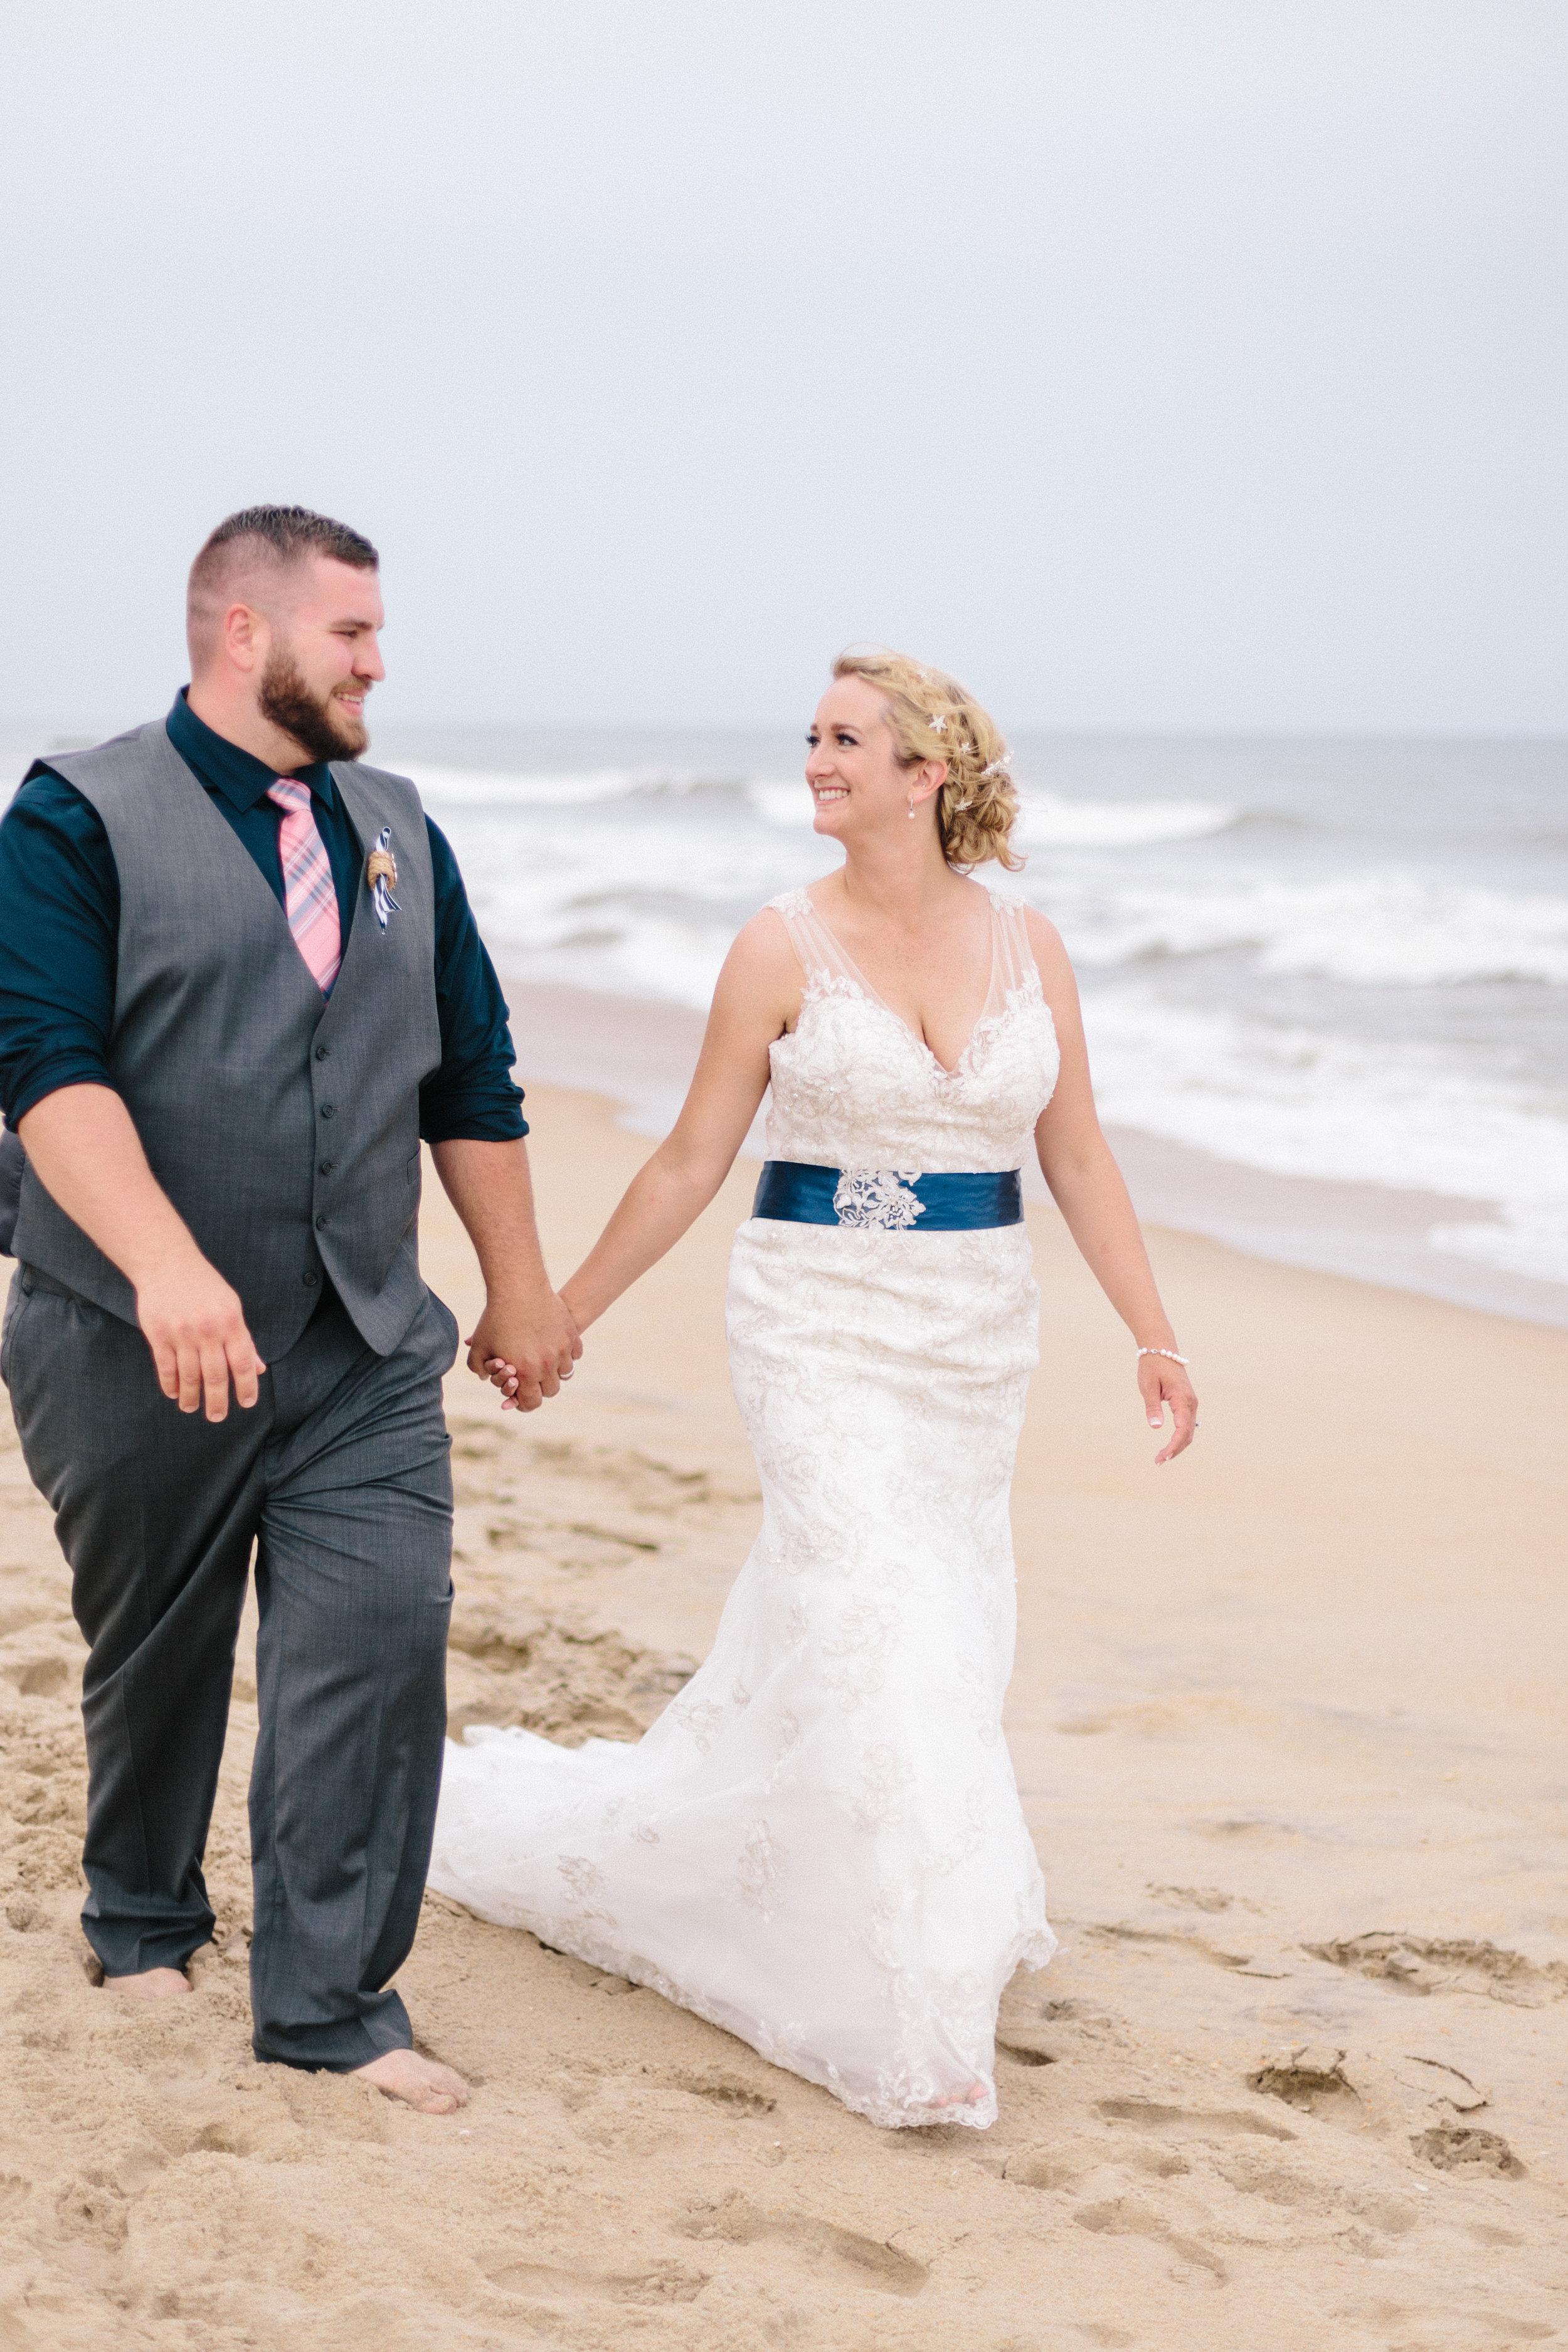 alyssa barletter photography buxton north carolina outer banks obx cape hatteras elopement intmate beach wedding-37.jpg